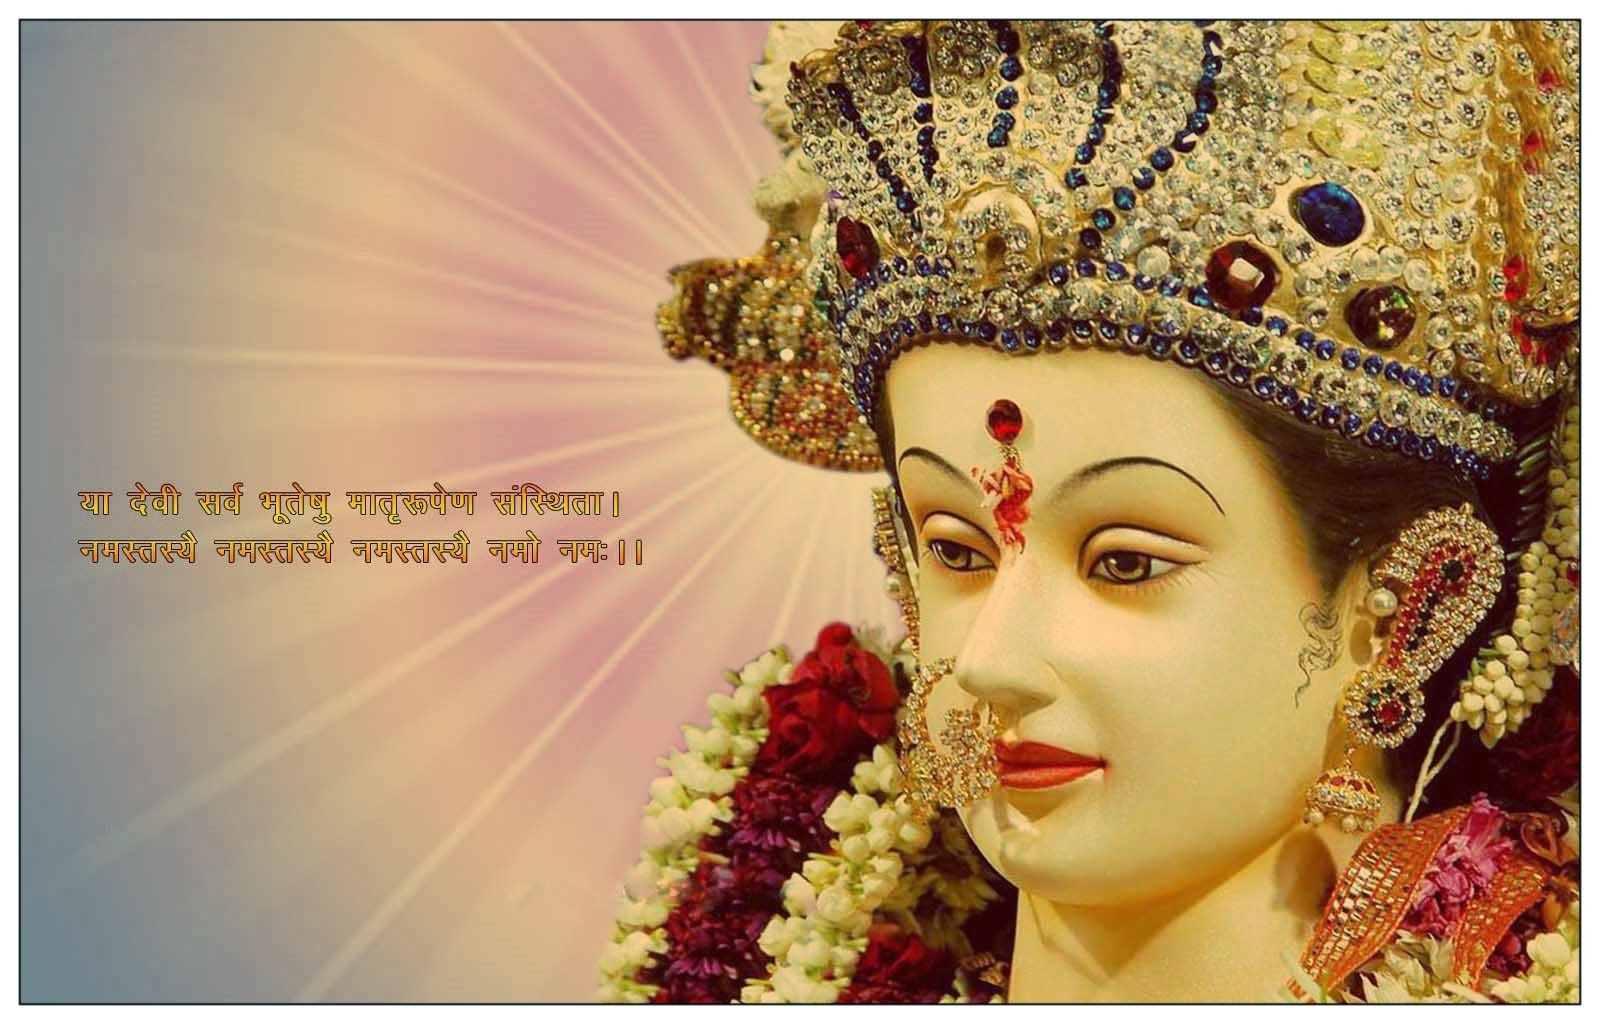 Wallpaper download karo - Hd Durga Maa Wallpapers